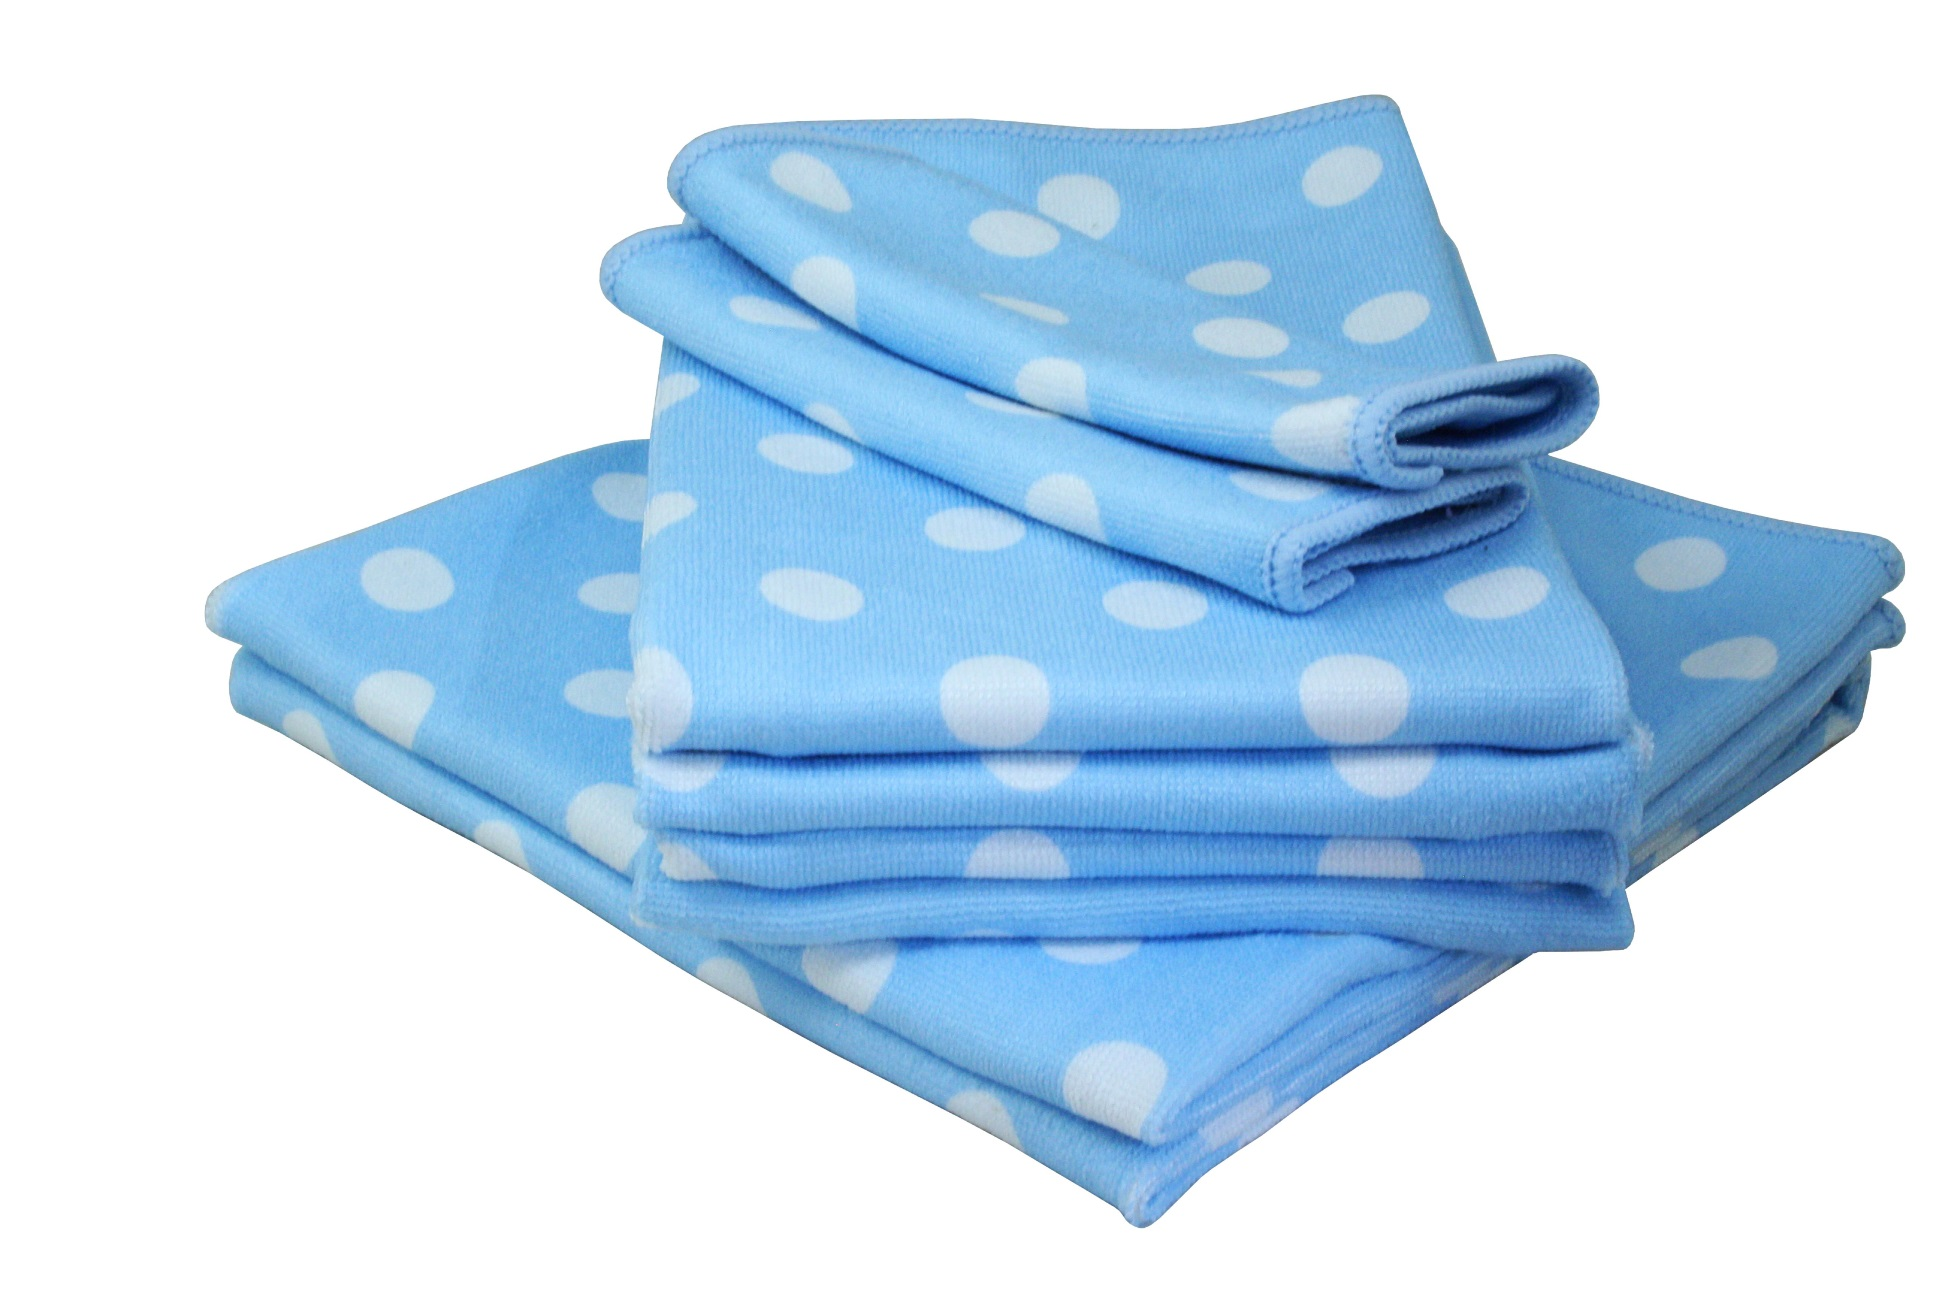 aqua clean reinigungsmittel aqua clean direkt vom. Black Bedroom Furniture Sets. Home Design Ideas